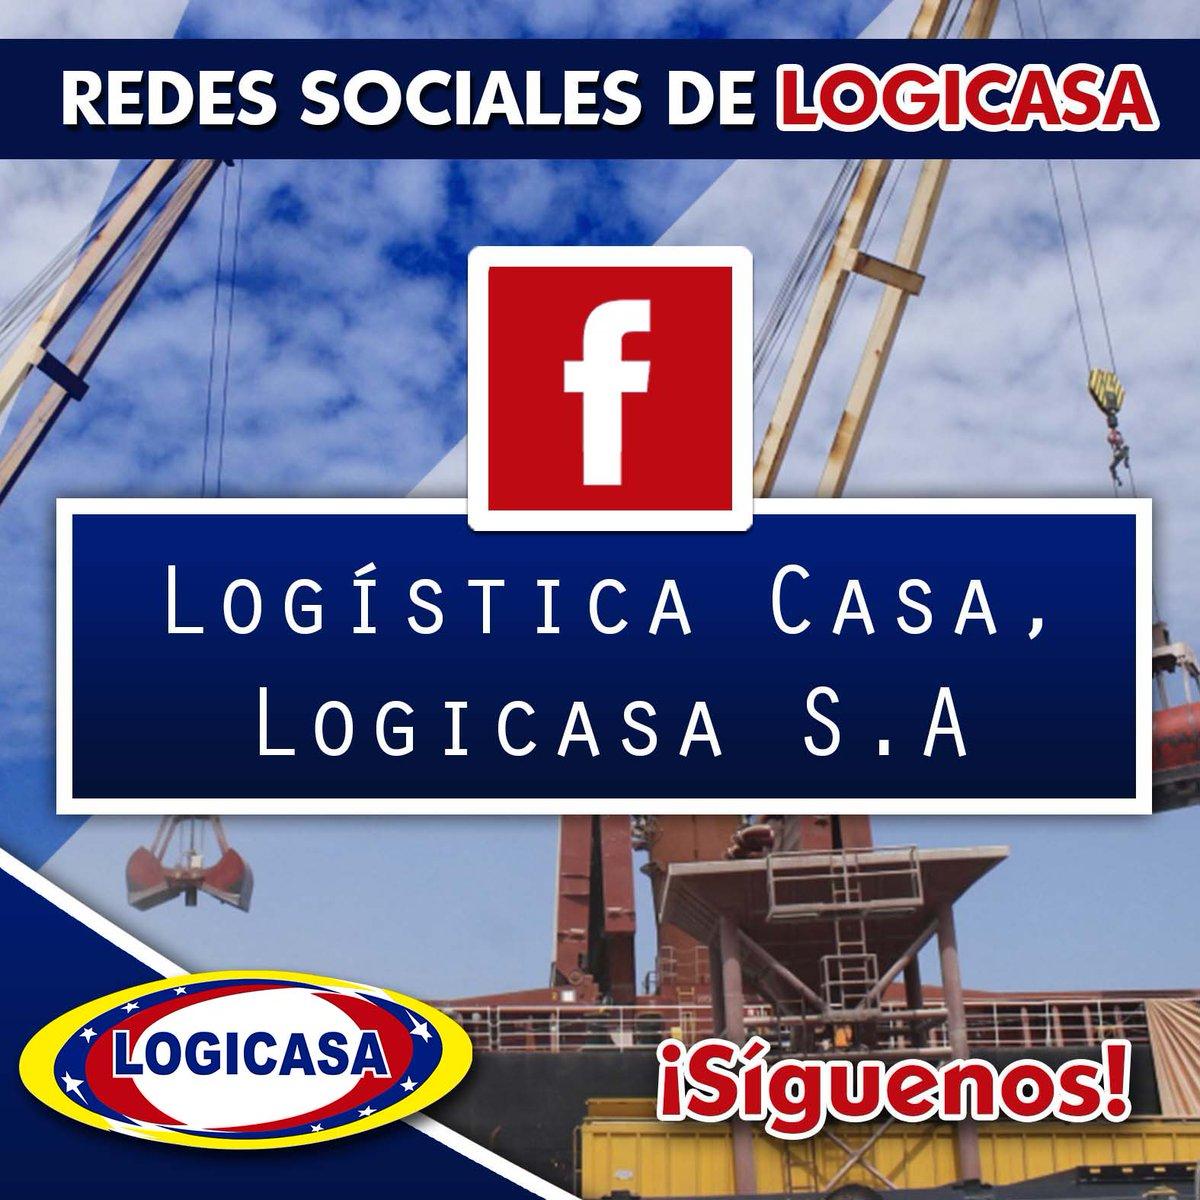 "#26Feb #RedesSociales | Entra a nuestra página en Facebook y dale ""Me gusta"" http://bit.ly/fblogicasa  #BalanceCarnavales2020pic.twitter.com/wRWDJy5ZQh"